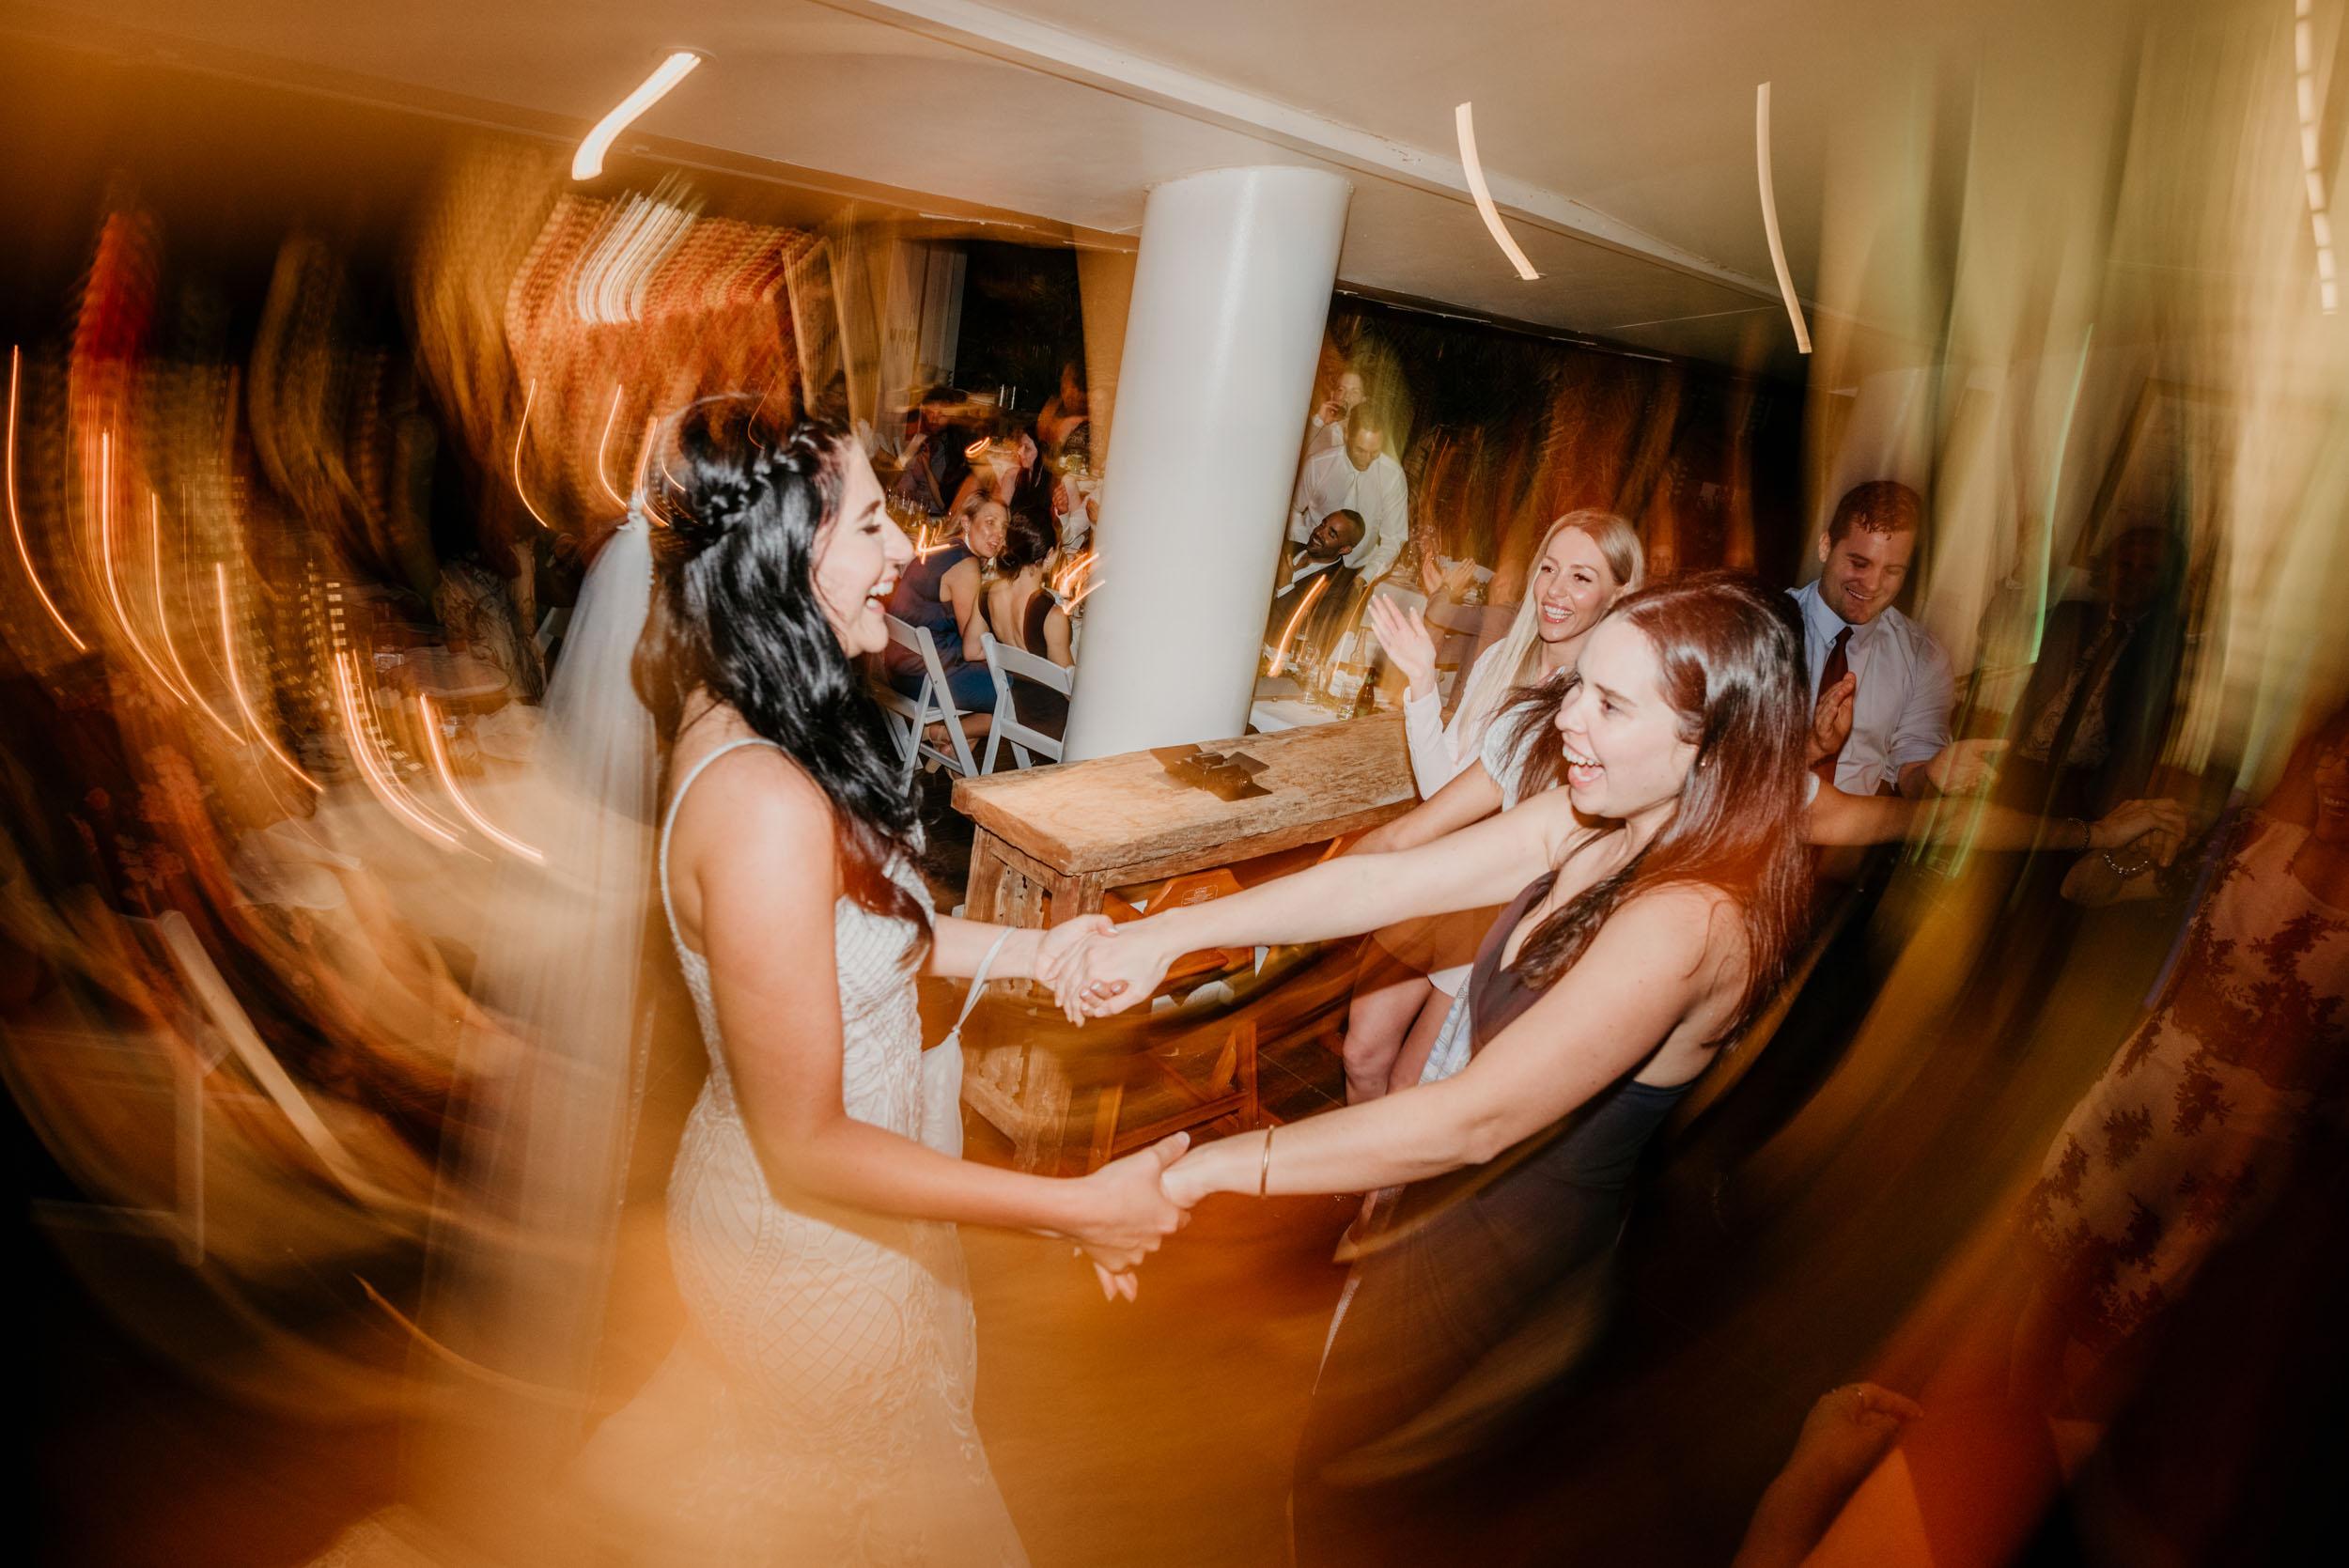 The Raw Photographer - Cairns Wedding Photographer - Beach Palm Cove Ceremony - Dress Irene Costa's Devine Bridal - Queensland-77.jpg